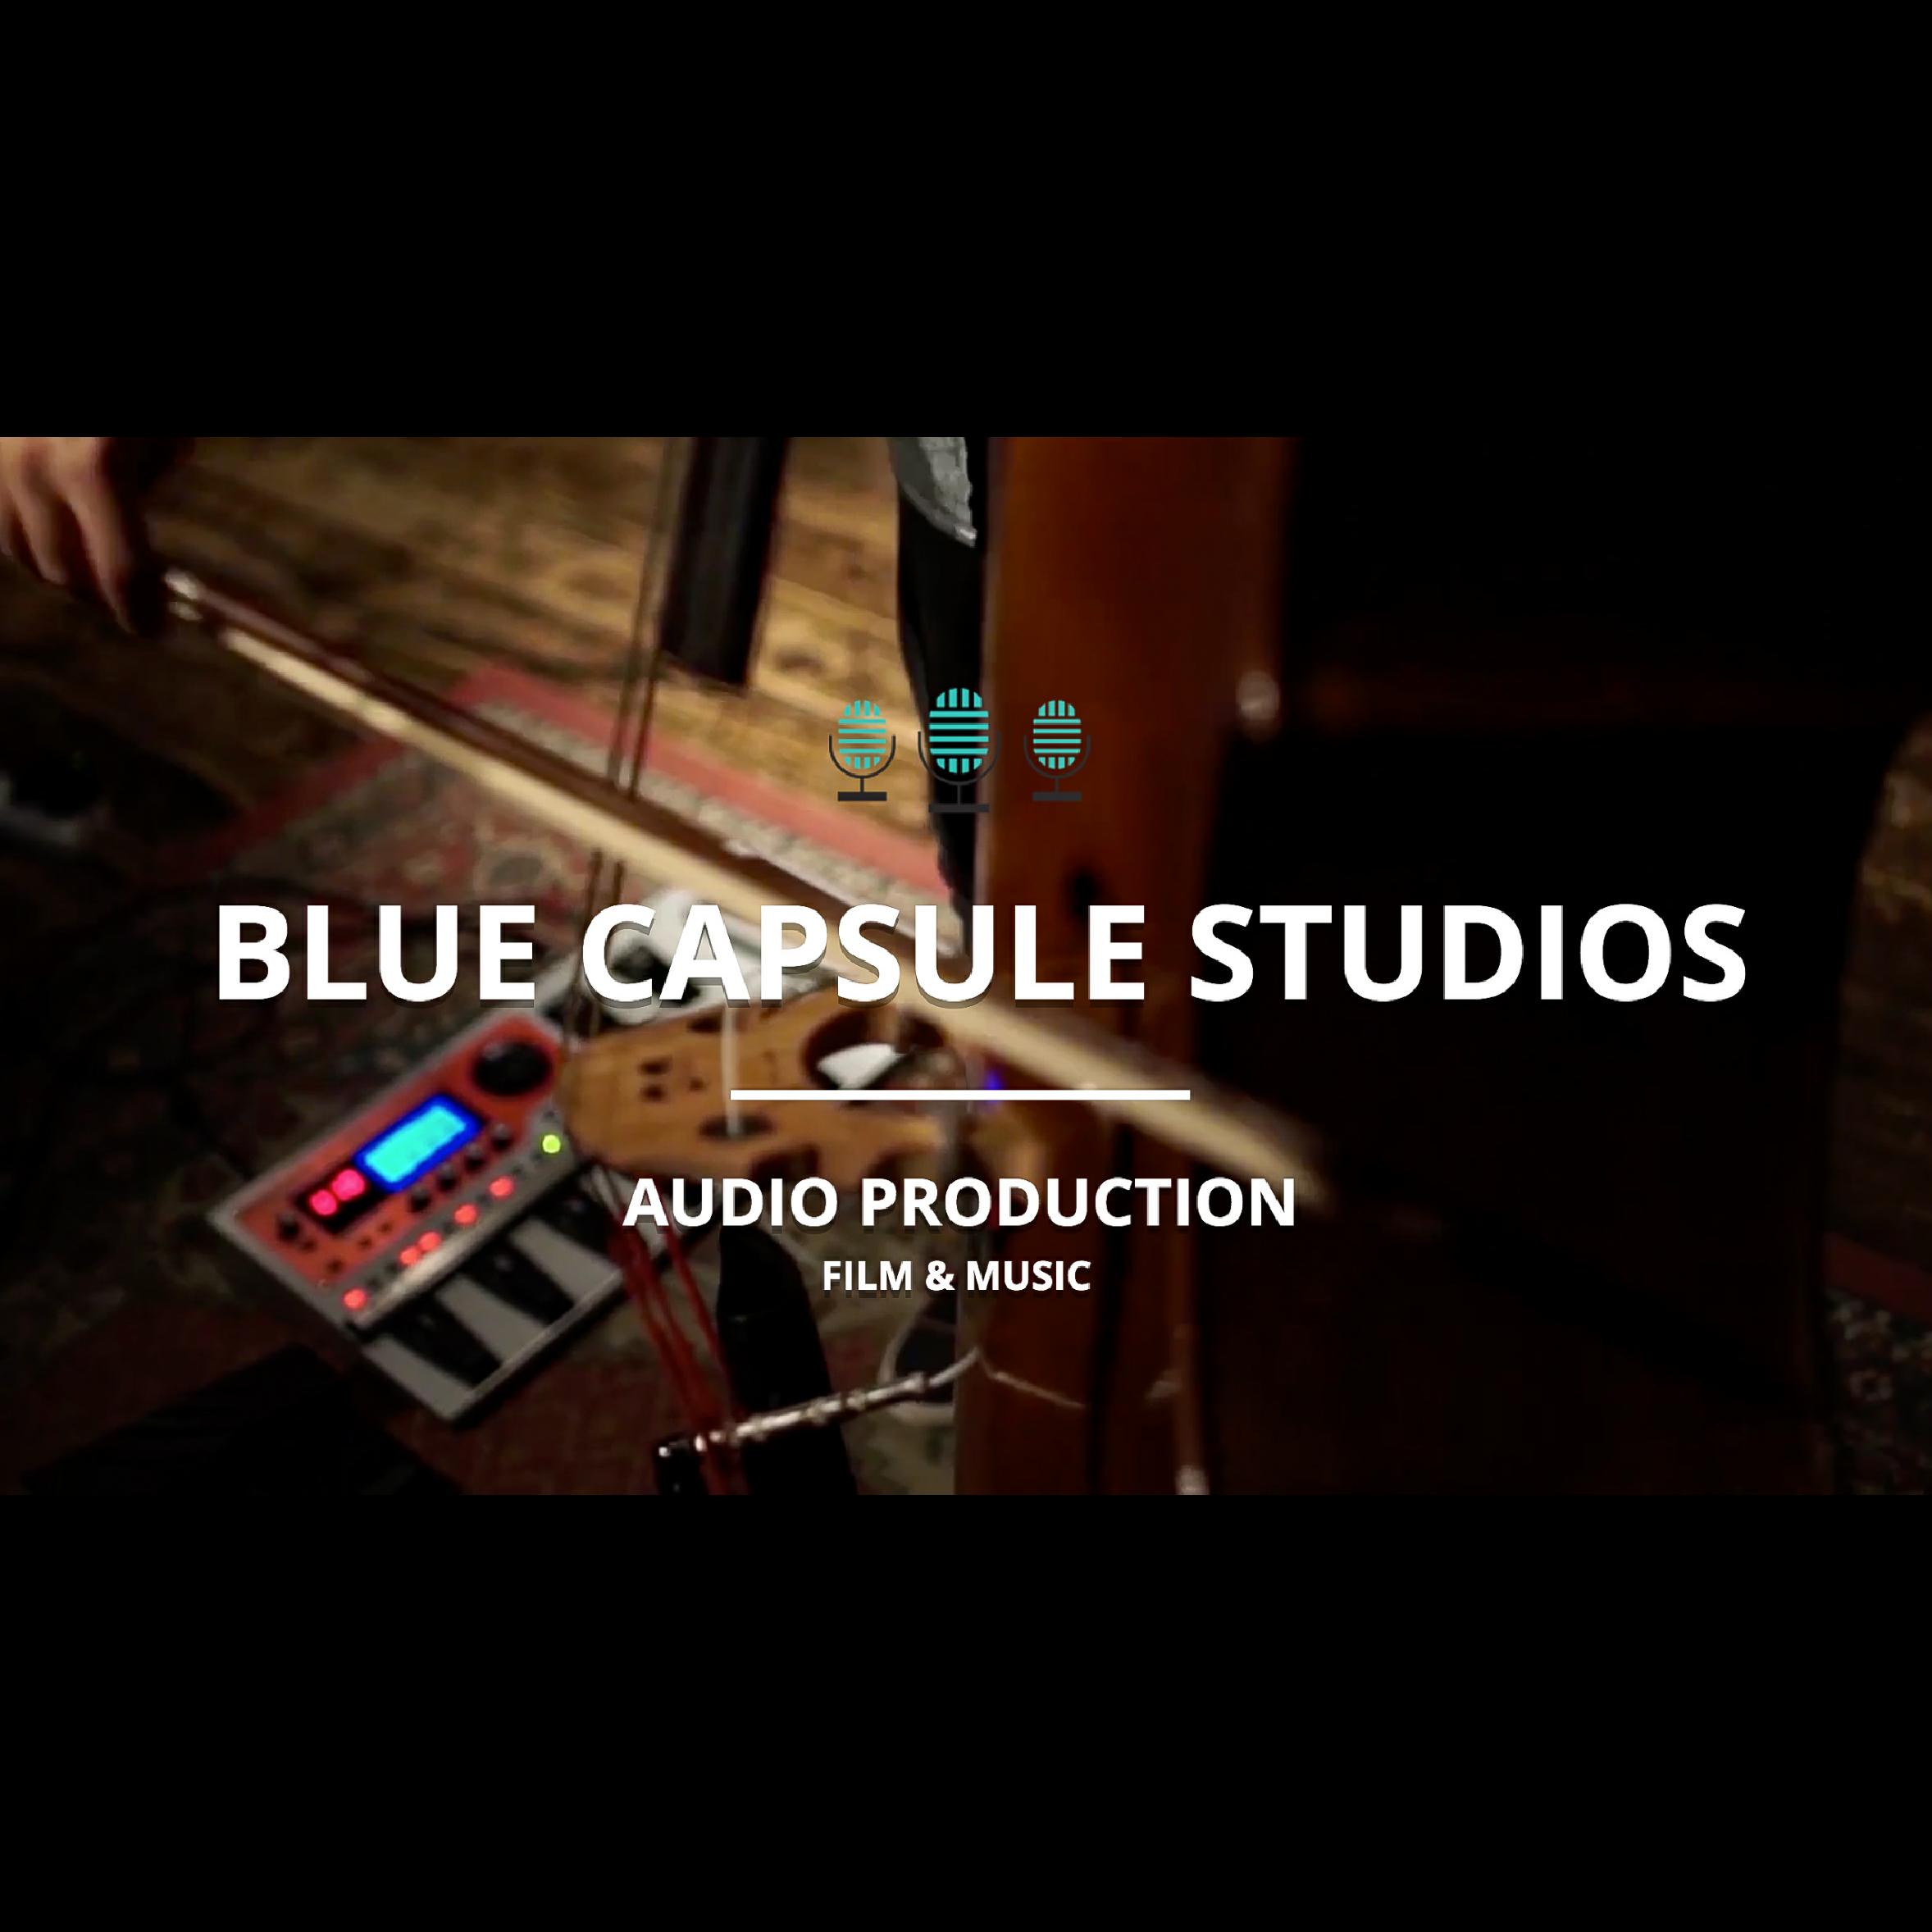 Blue Capsule Studios Vancouver